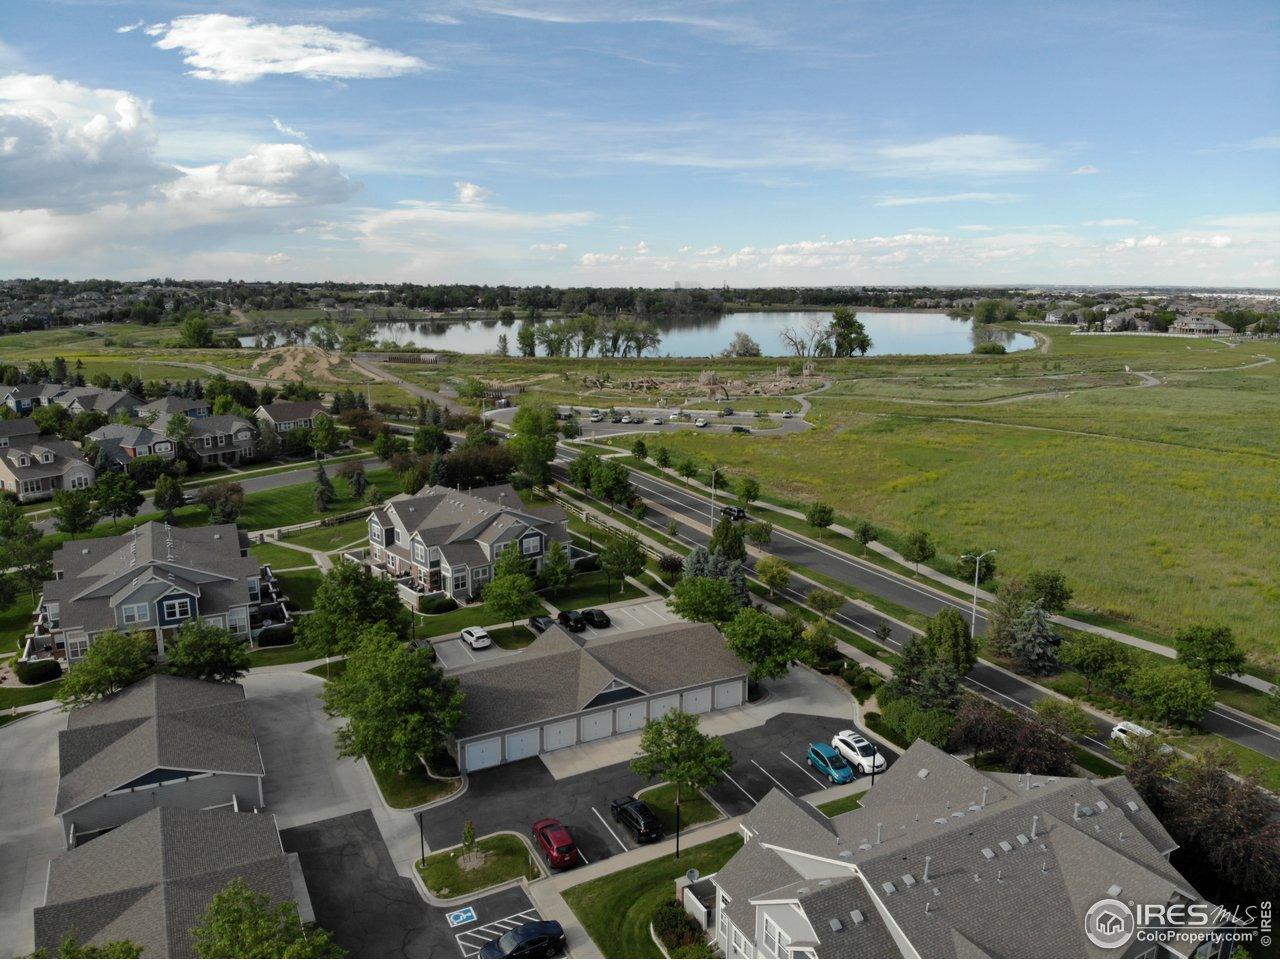 McKay Lake - Broomfield Bike Park and Kids Area